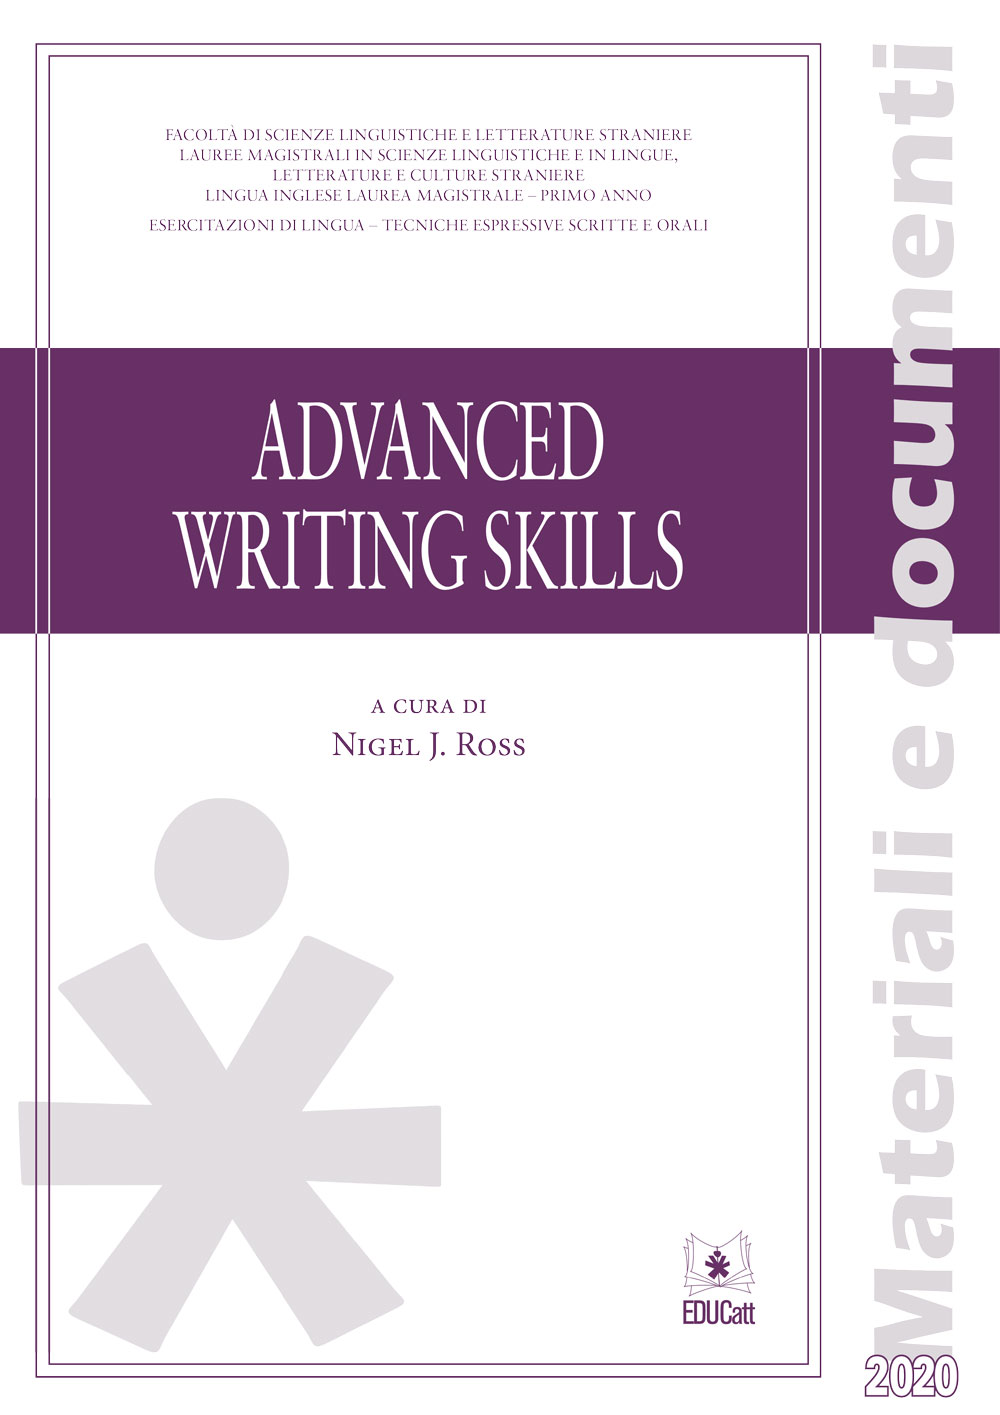 ADVANCED WRITING SKILLS 2020